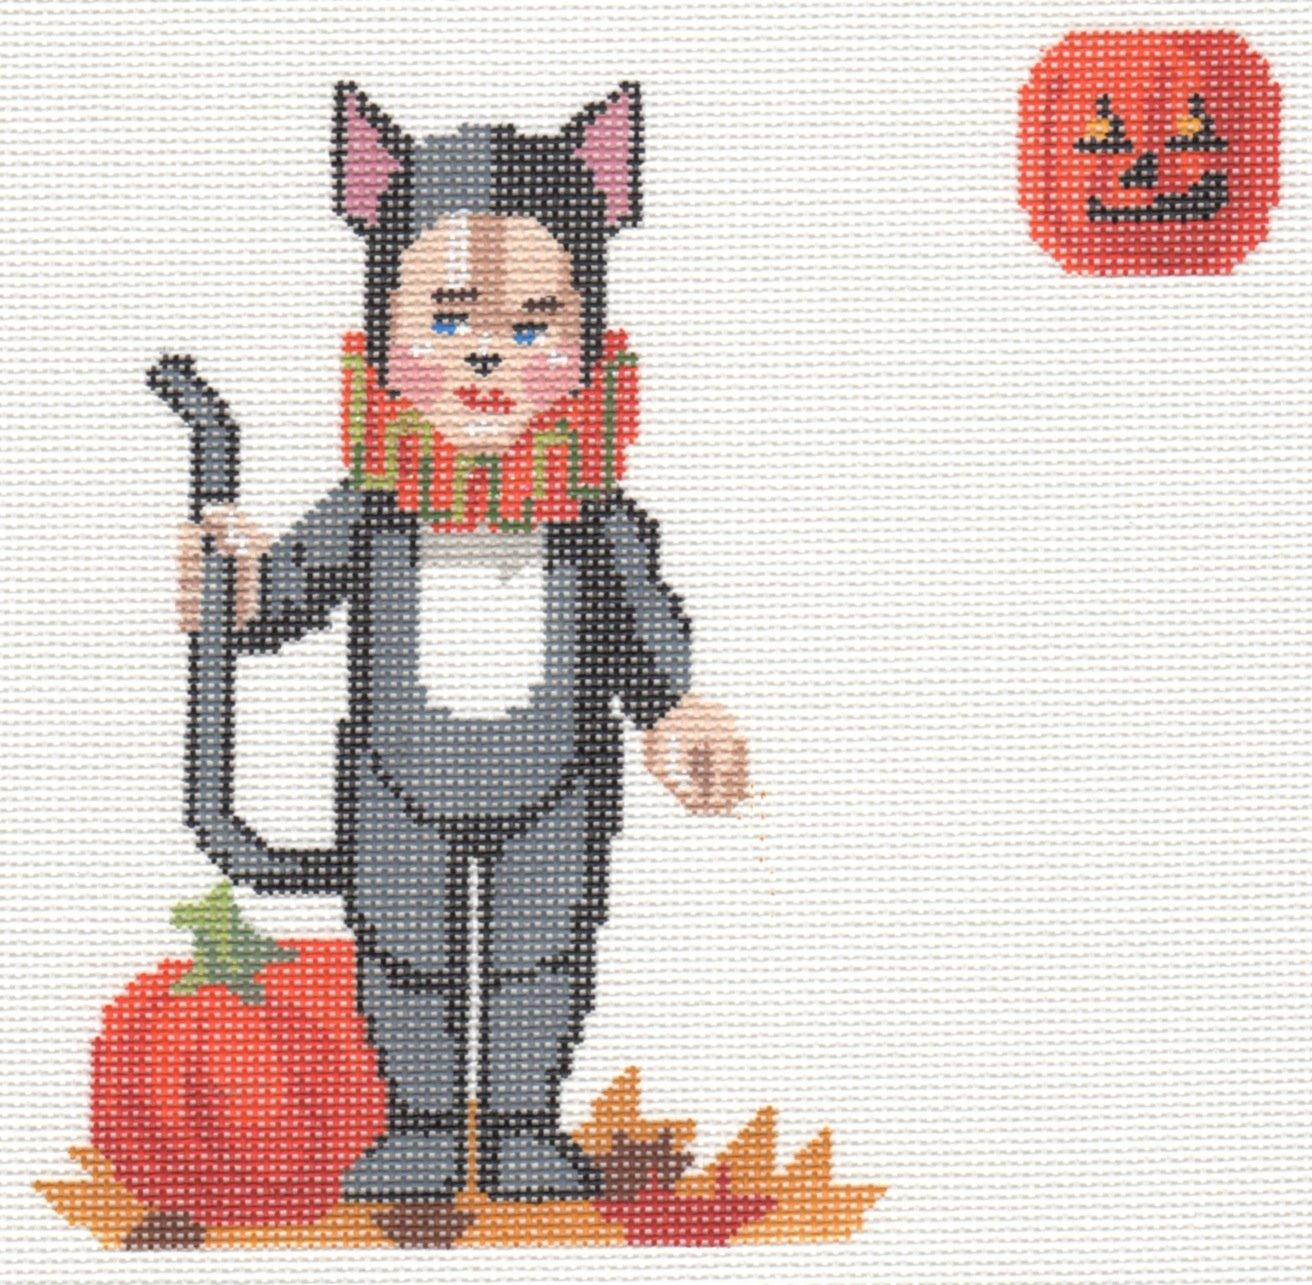 LL221 Kitty Boo